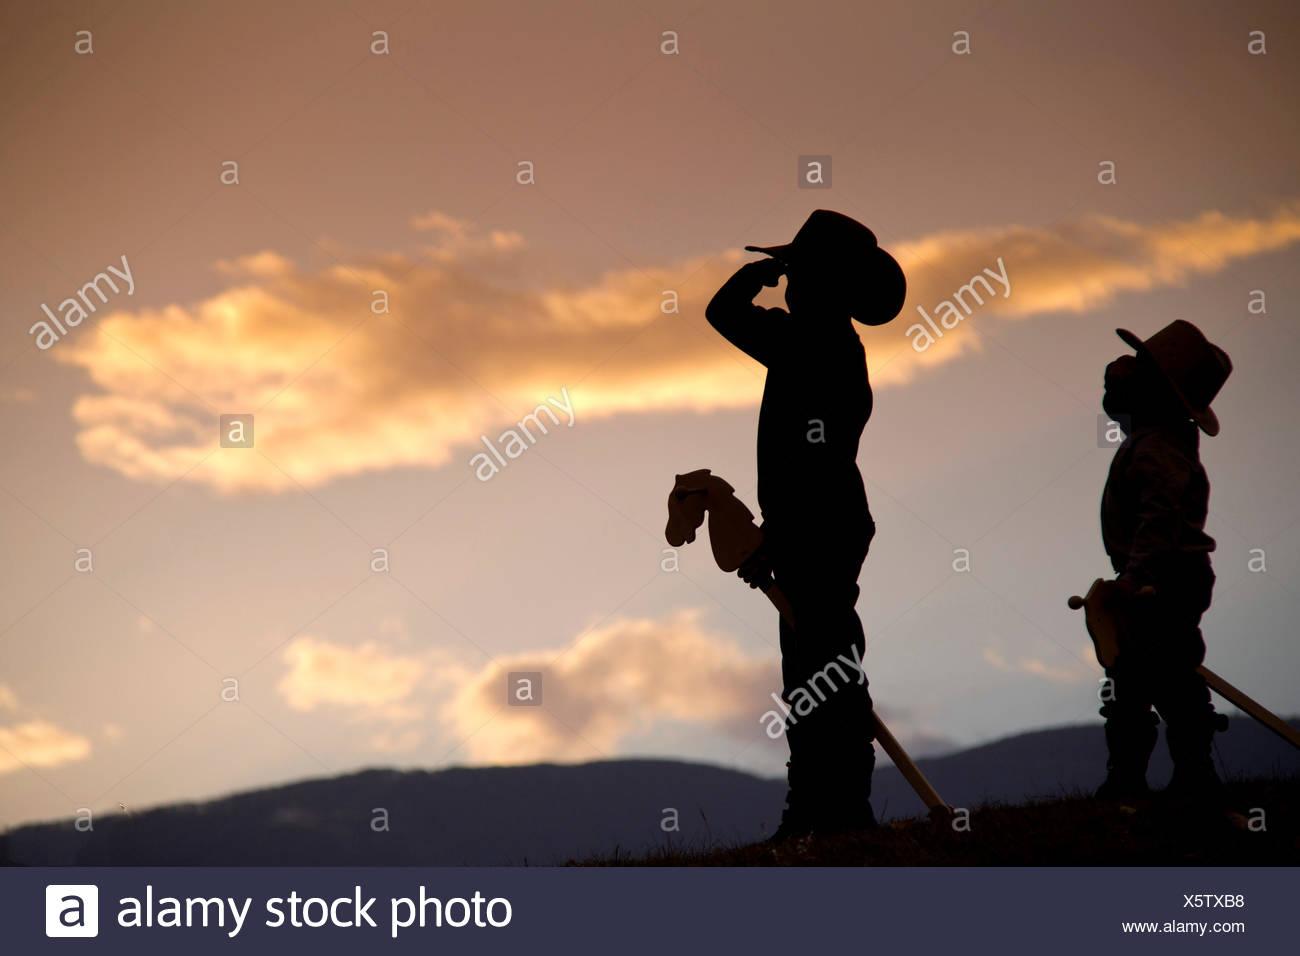 Silueta de dos muchachos con hobby caballos fingiendo ser cowboys saludando con orgullo Imagen De Stock